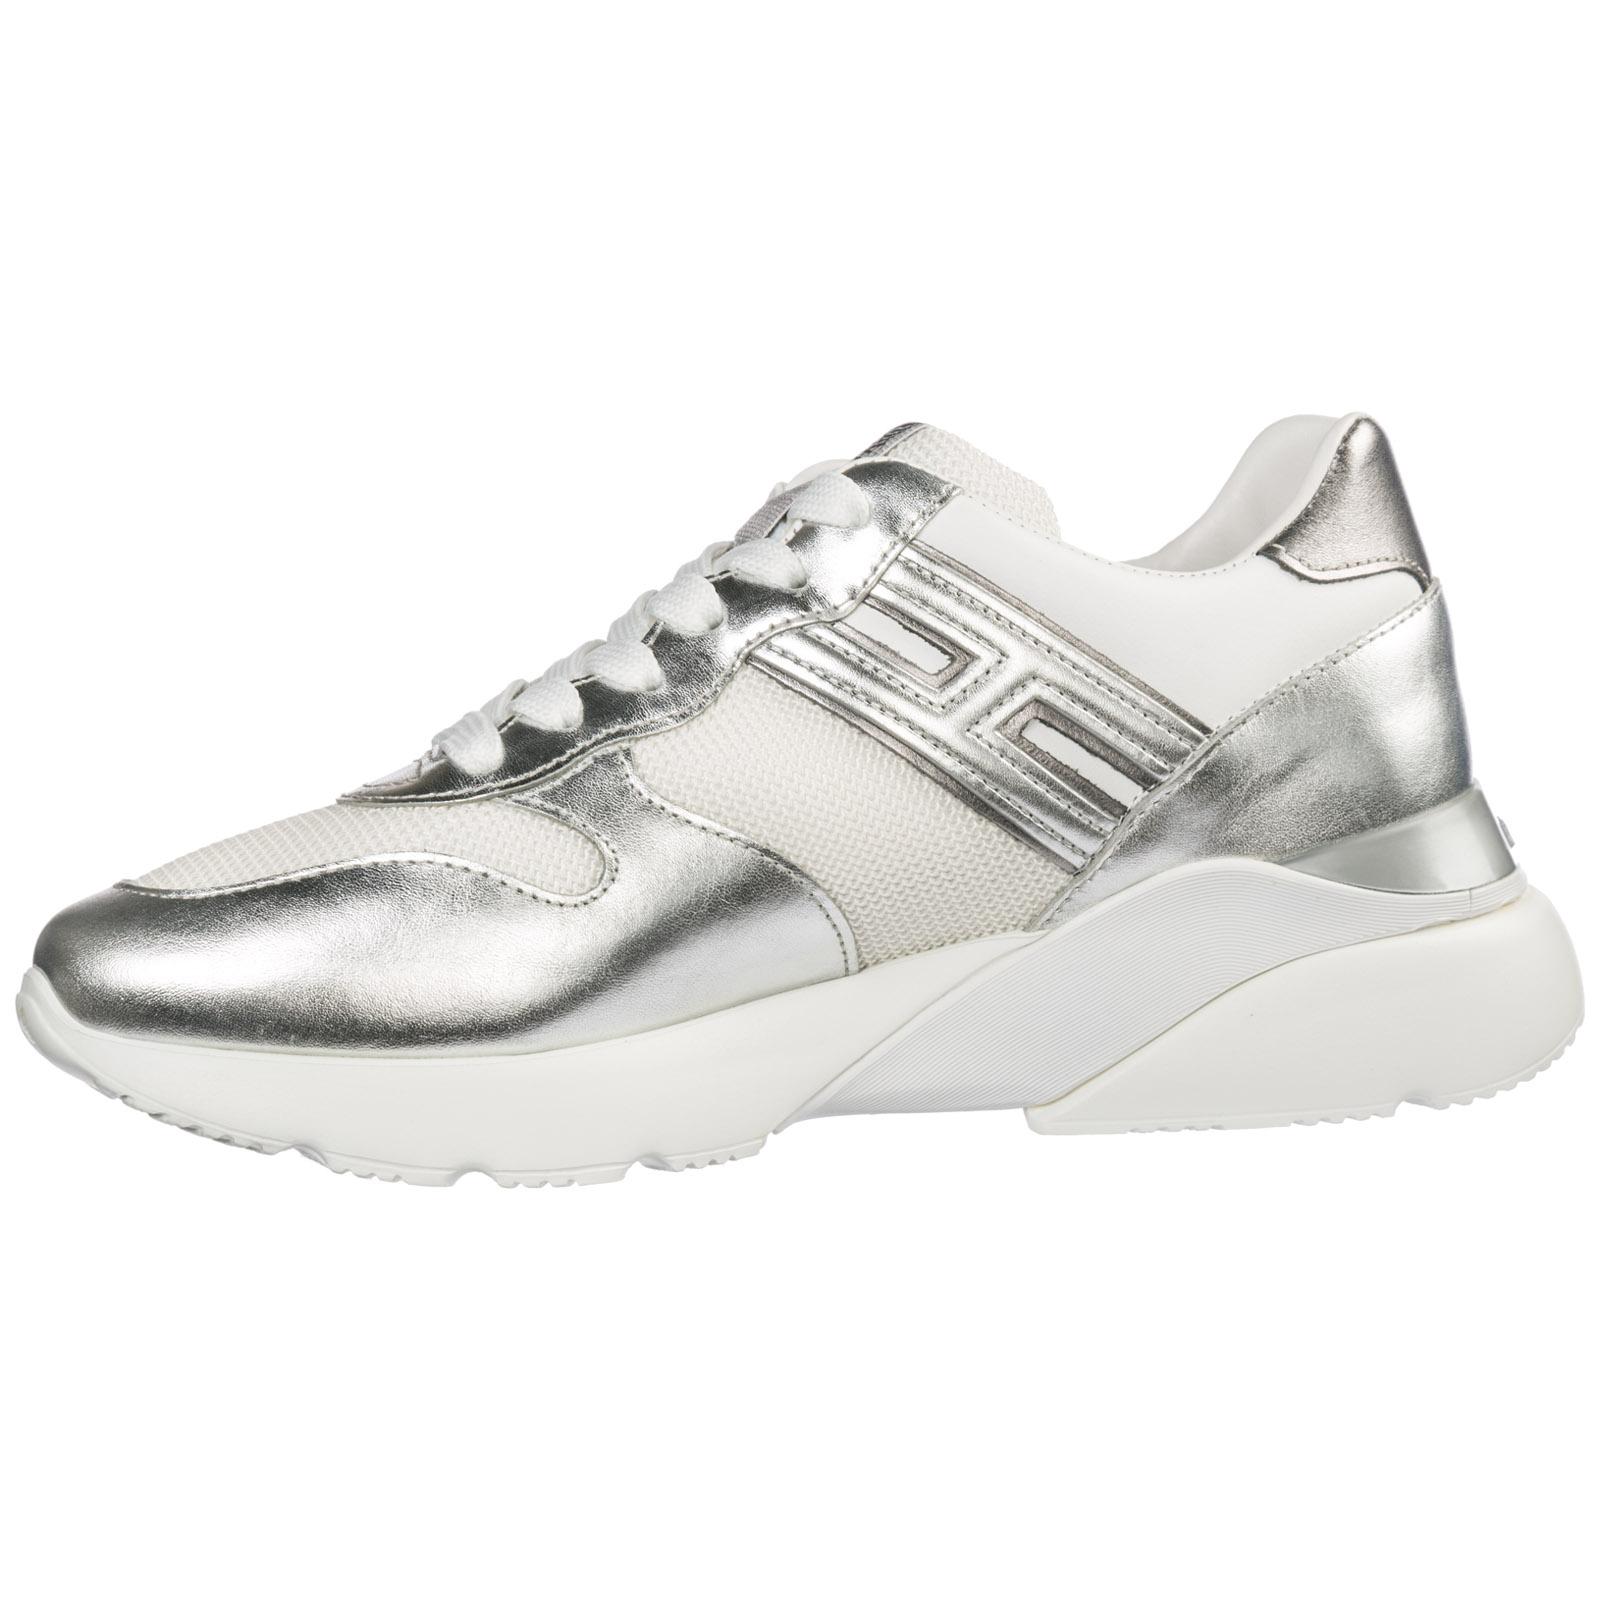 Active Damenschuhe Turnschuhe Damen One Leder Schuhe Sneakers xWdCBore